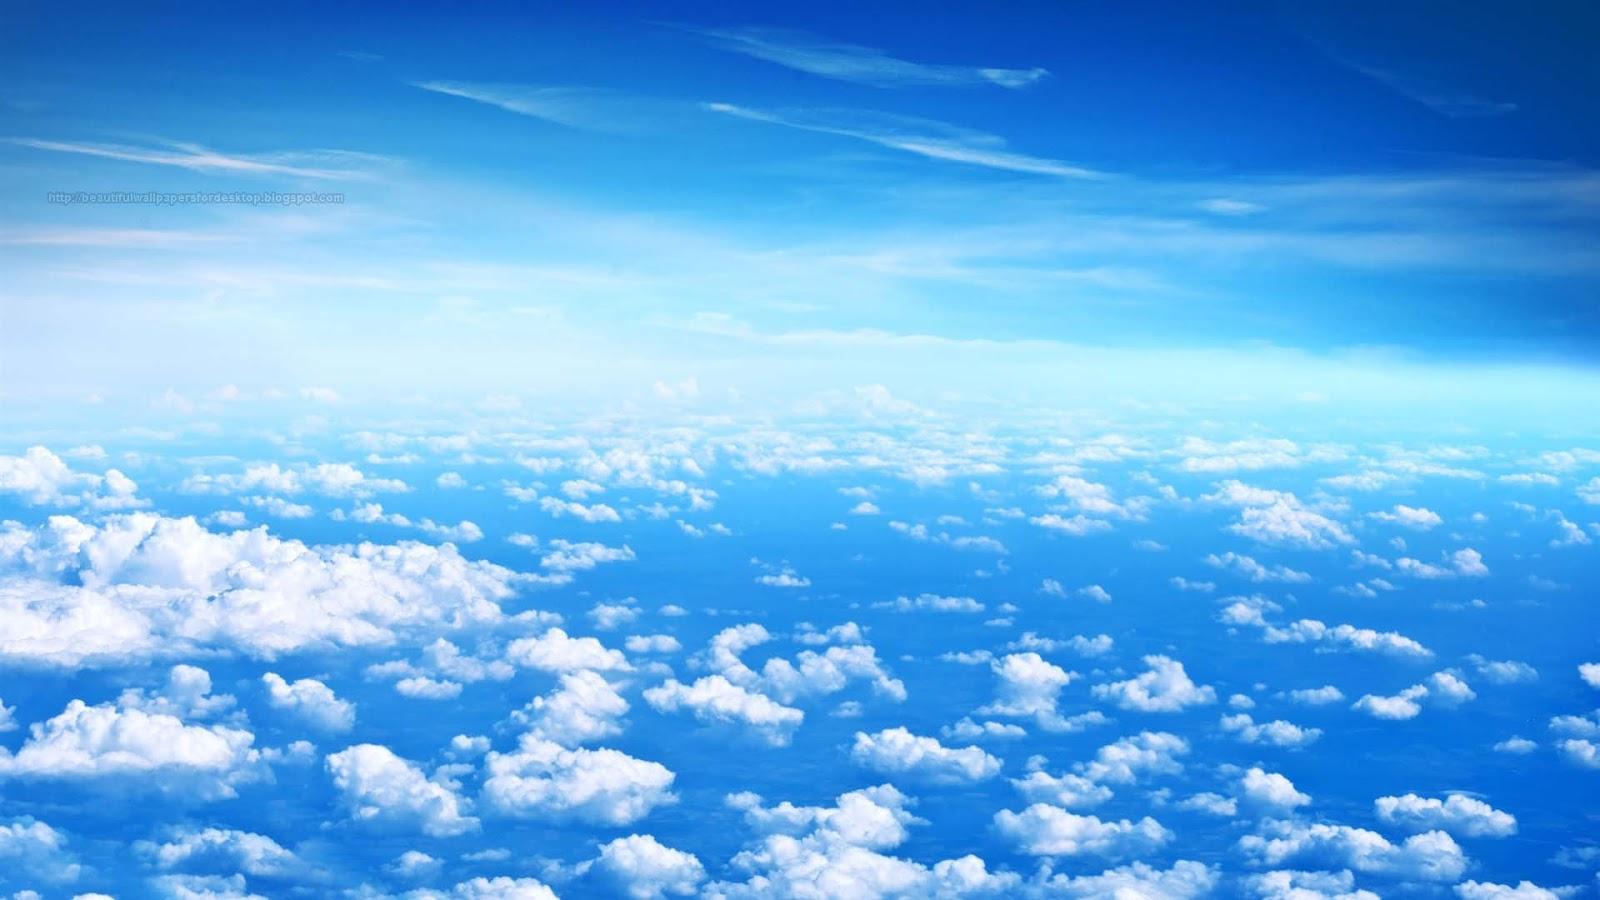 Beautiful Wallpapers For Desktop sky cloud wallpapers hd 1600x900